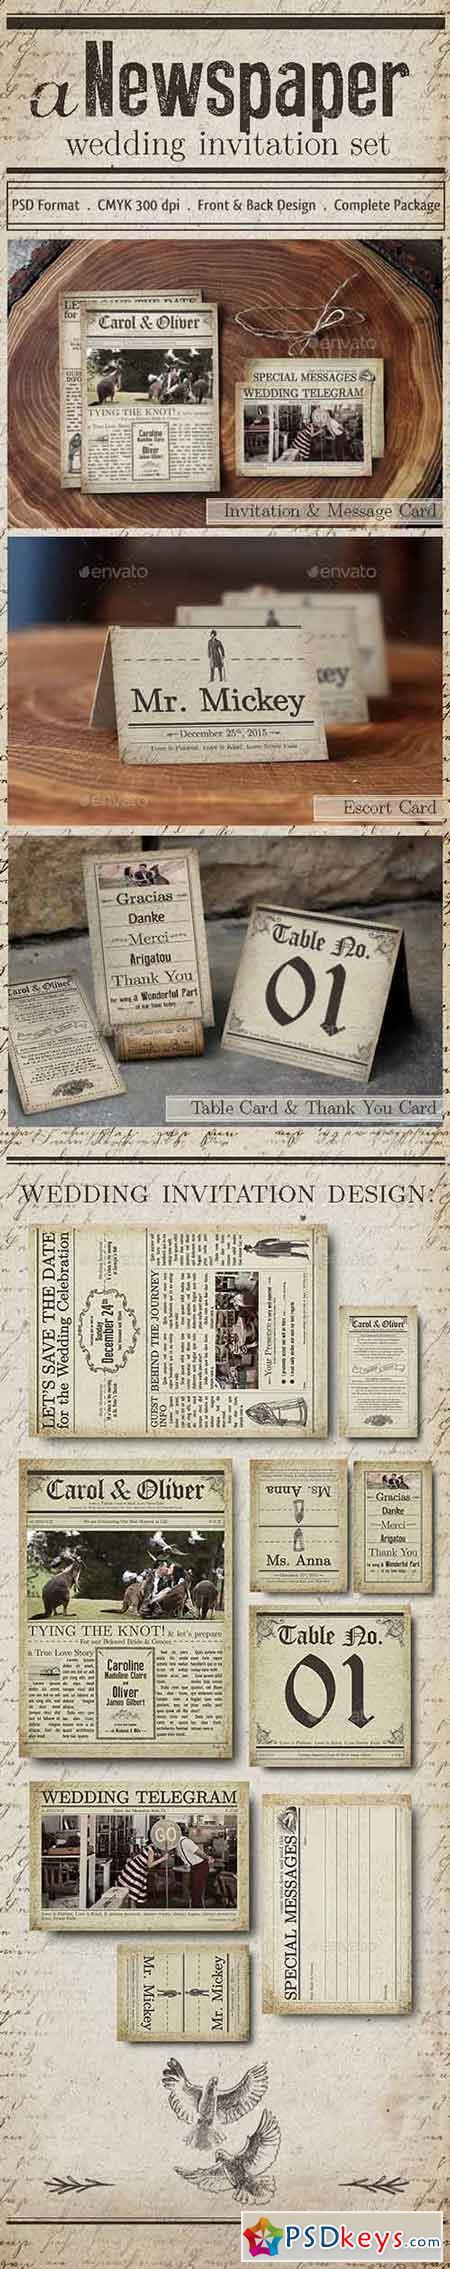 Newspaper Wedding Invitation 11341666